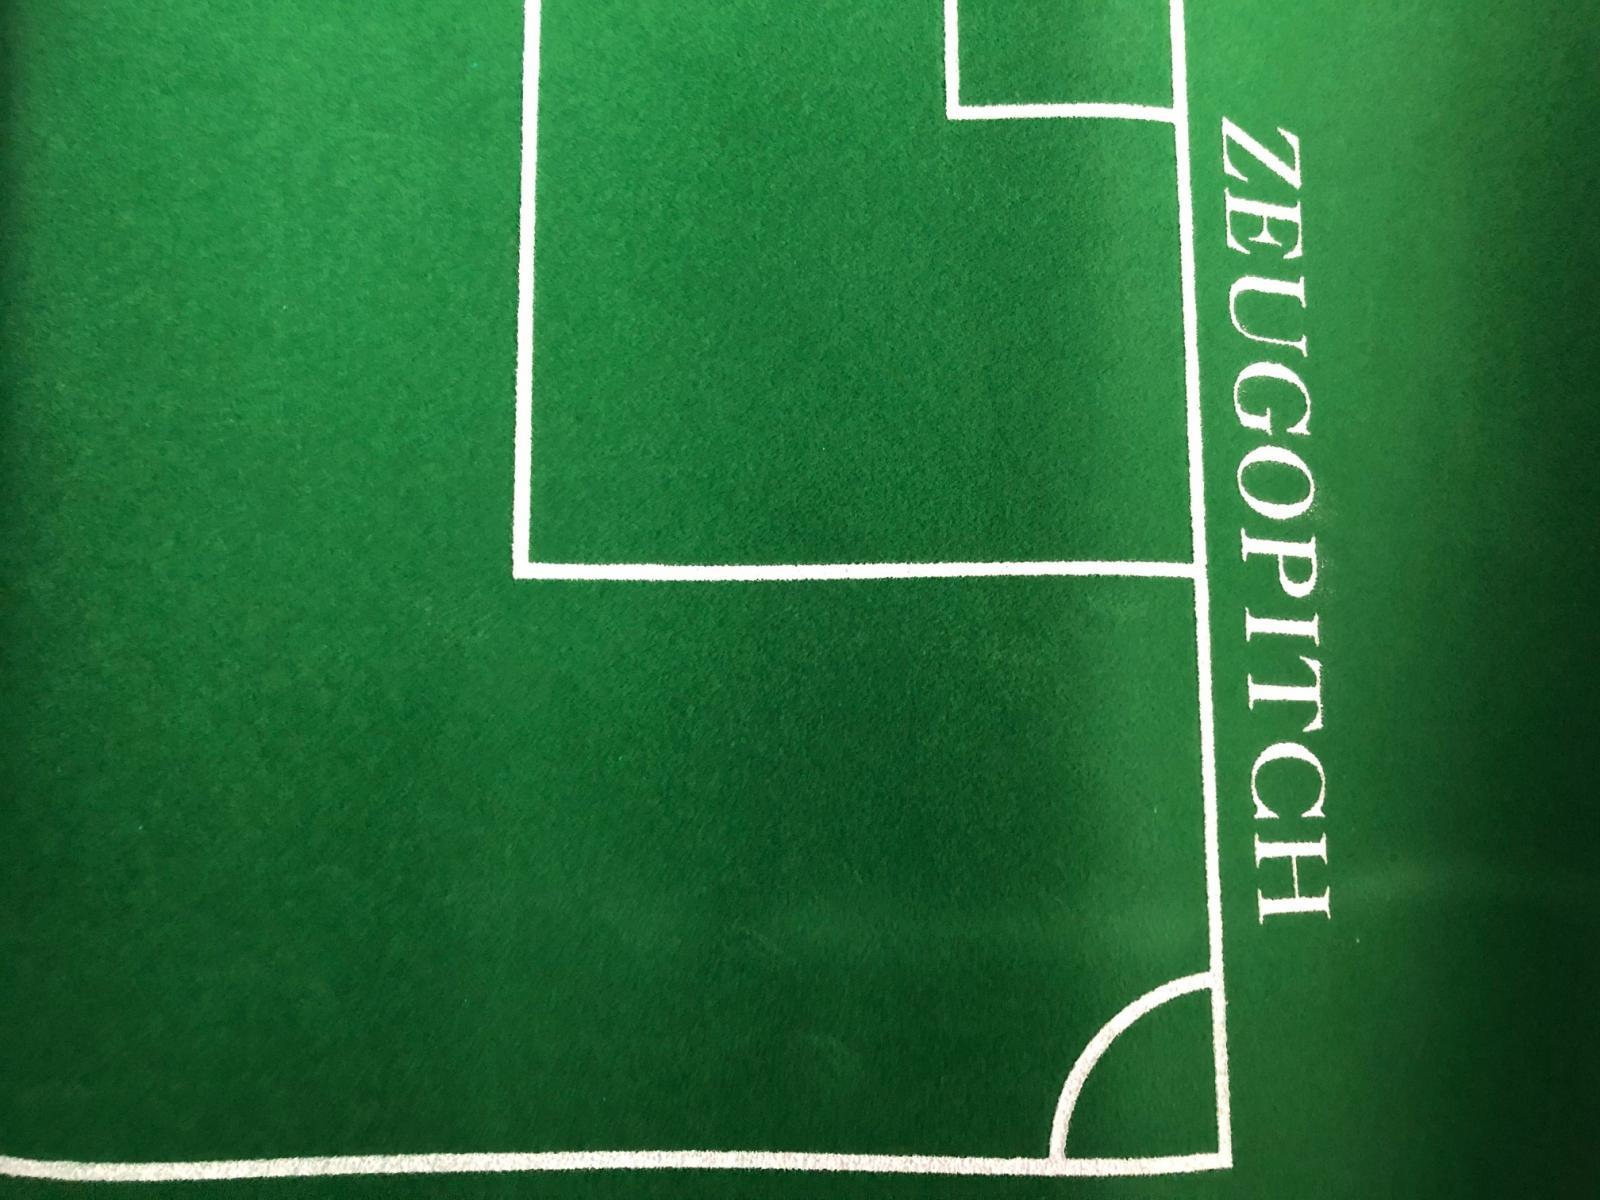 Zeugo pitch Compact